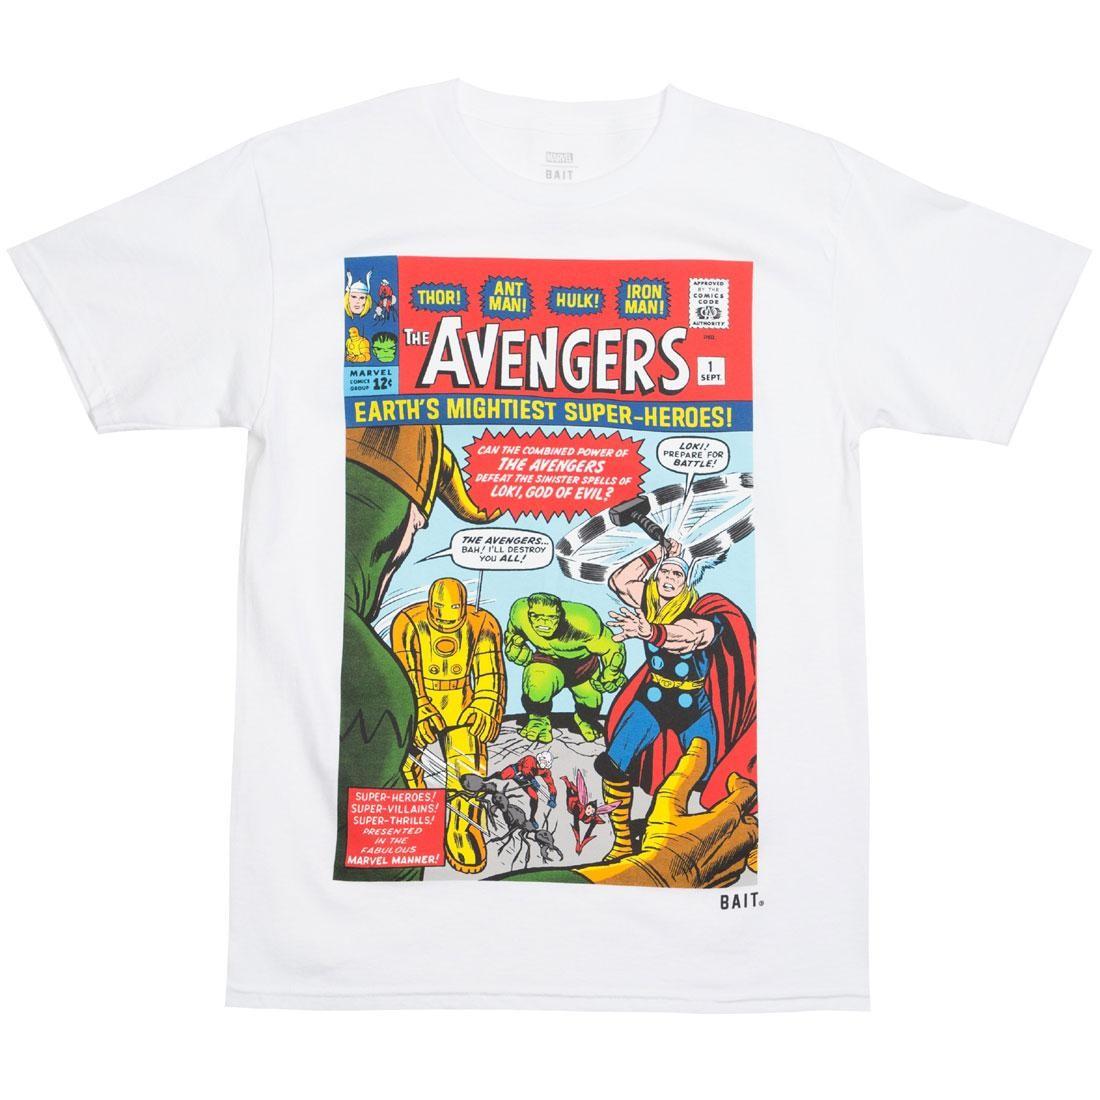 BAIT x Marvel Men Avengers - Earth's Mightiest Heroes Tee (white)